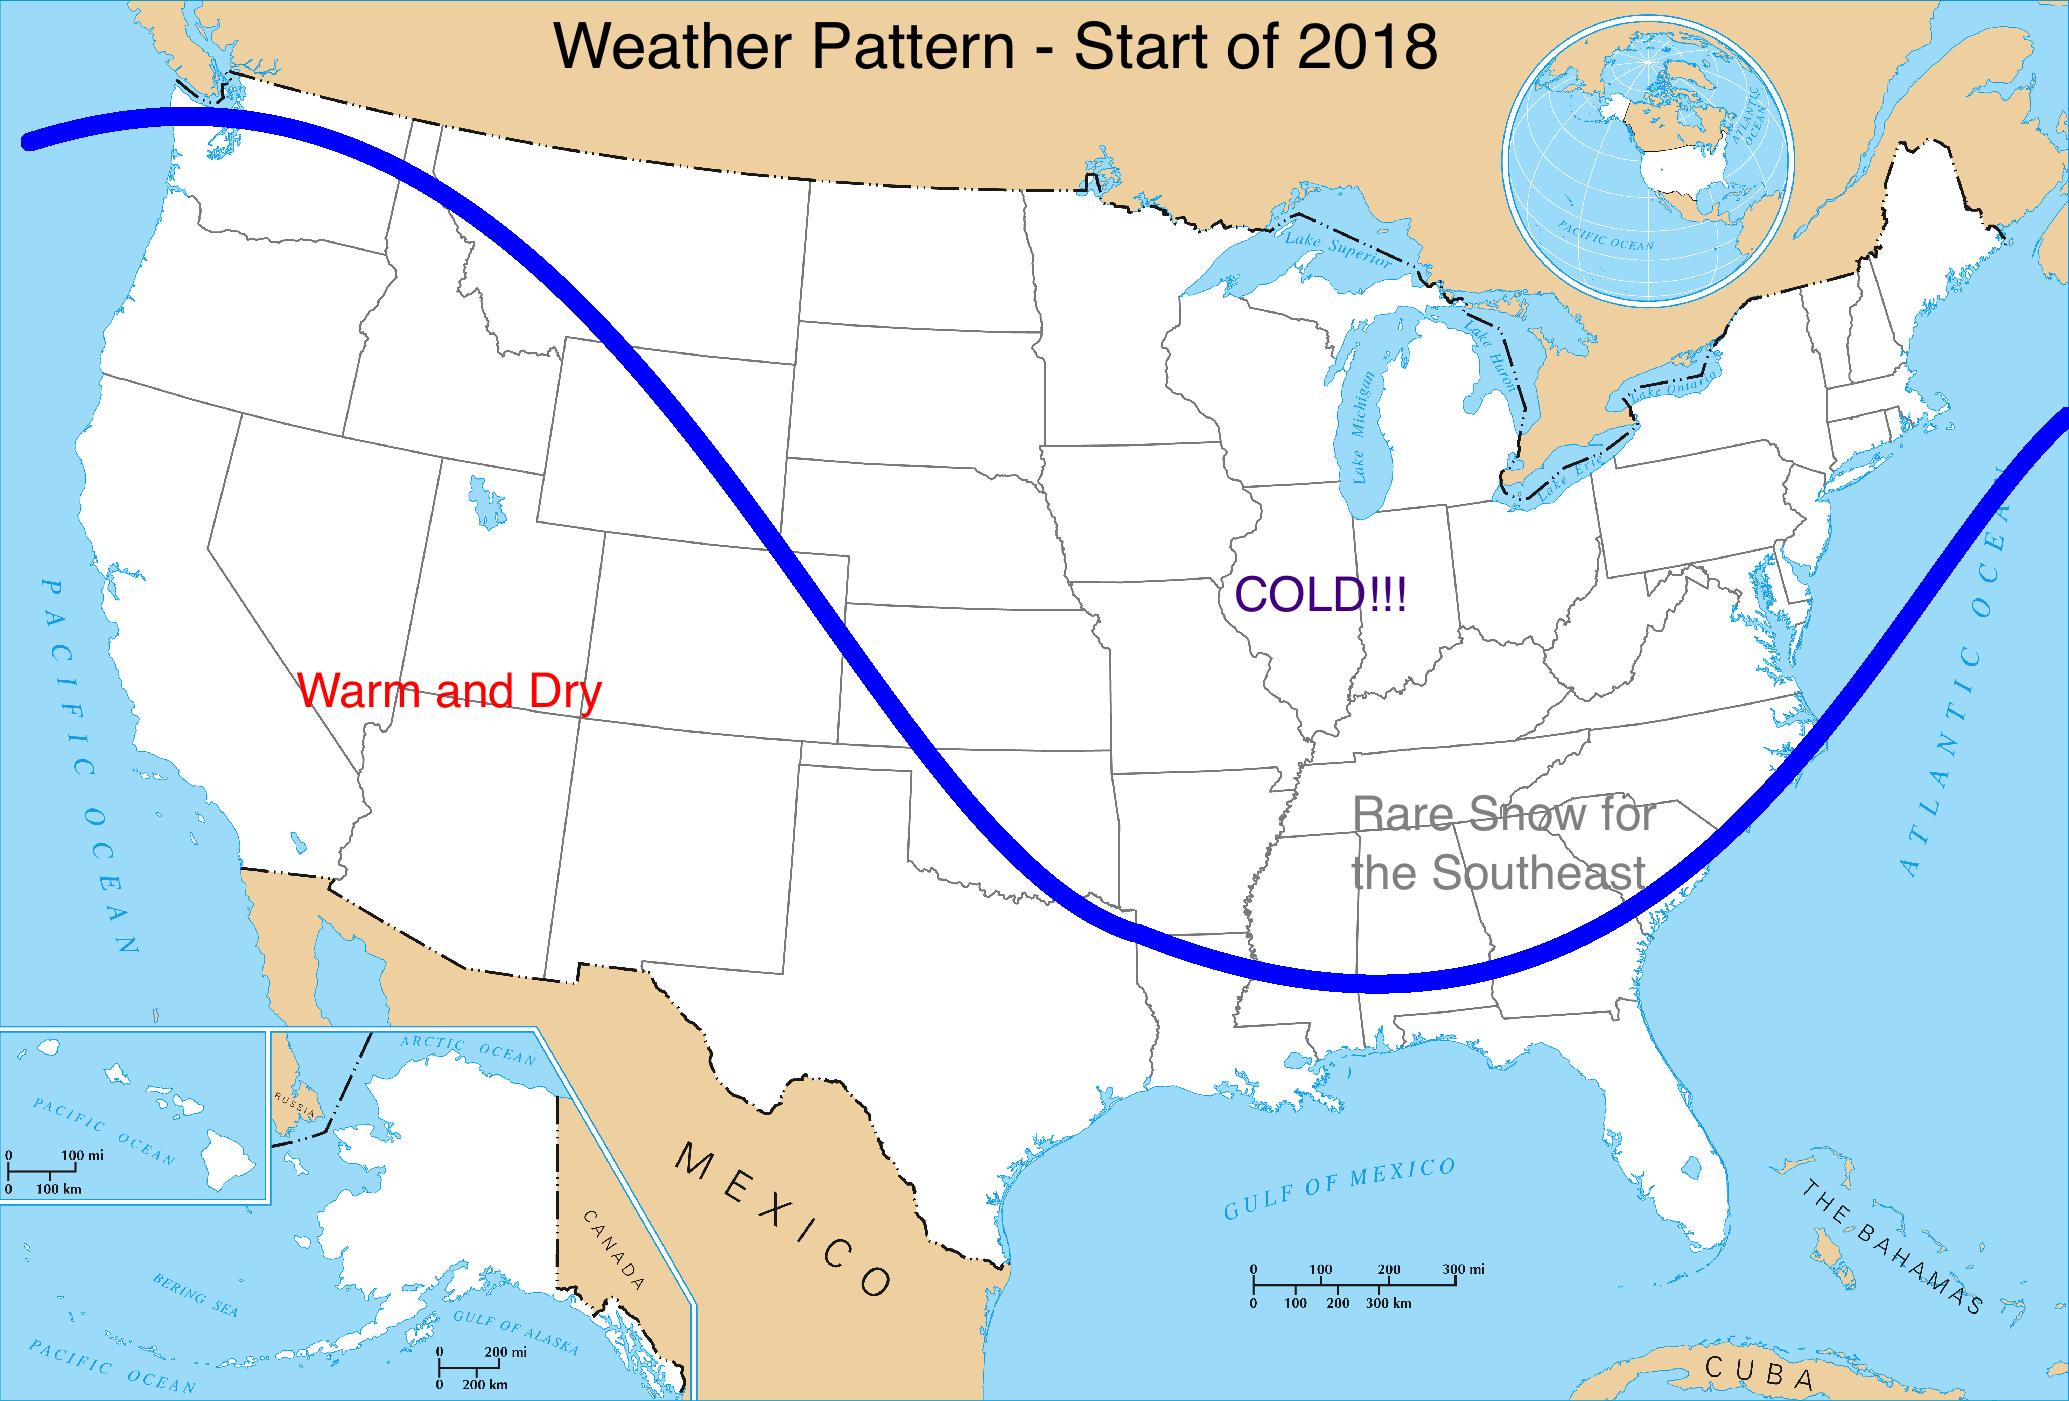 WeatherPattern_Startof2018